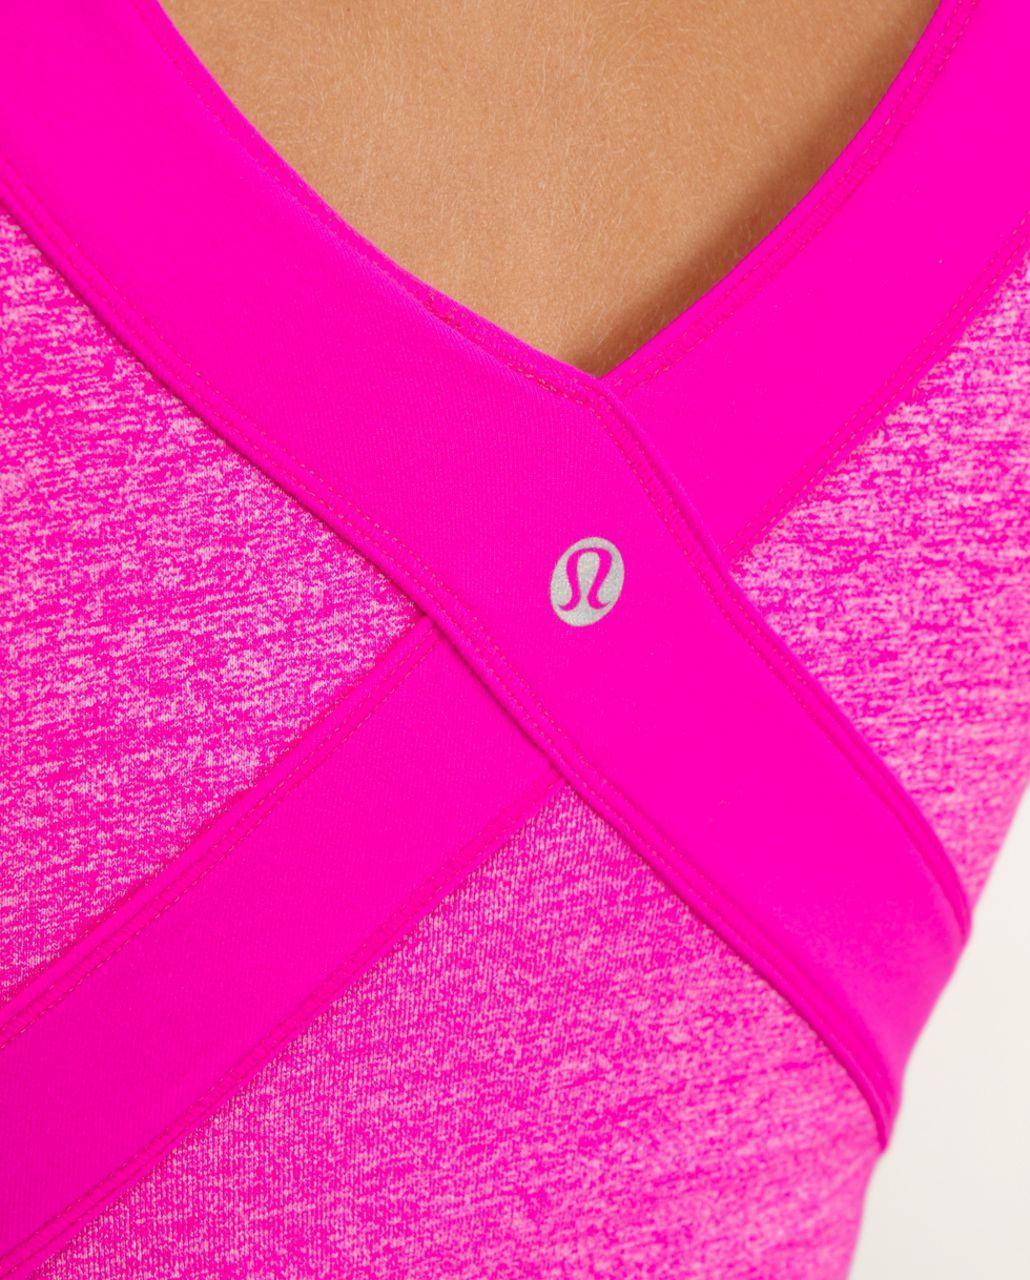 Lululemon Wrap Tank - Paris Pink